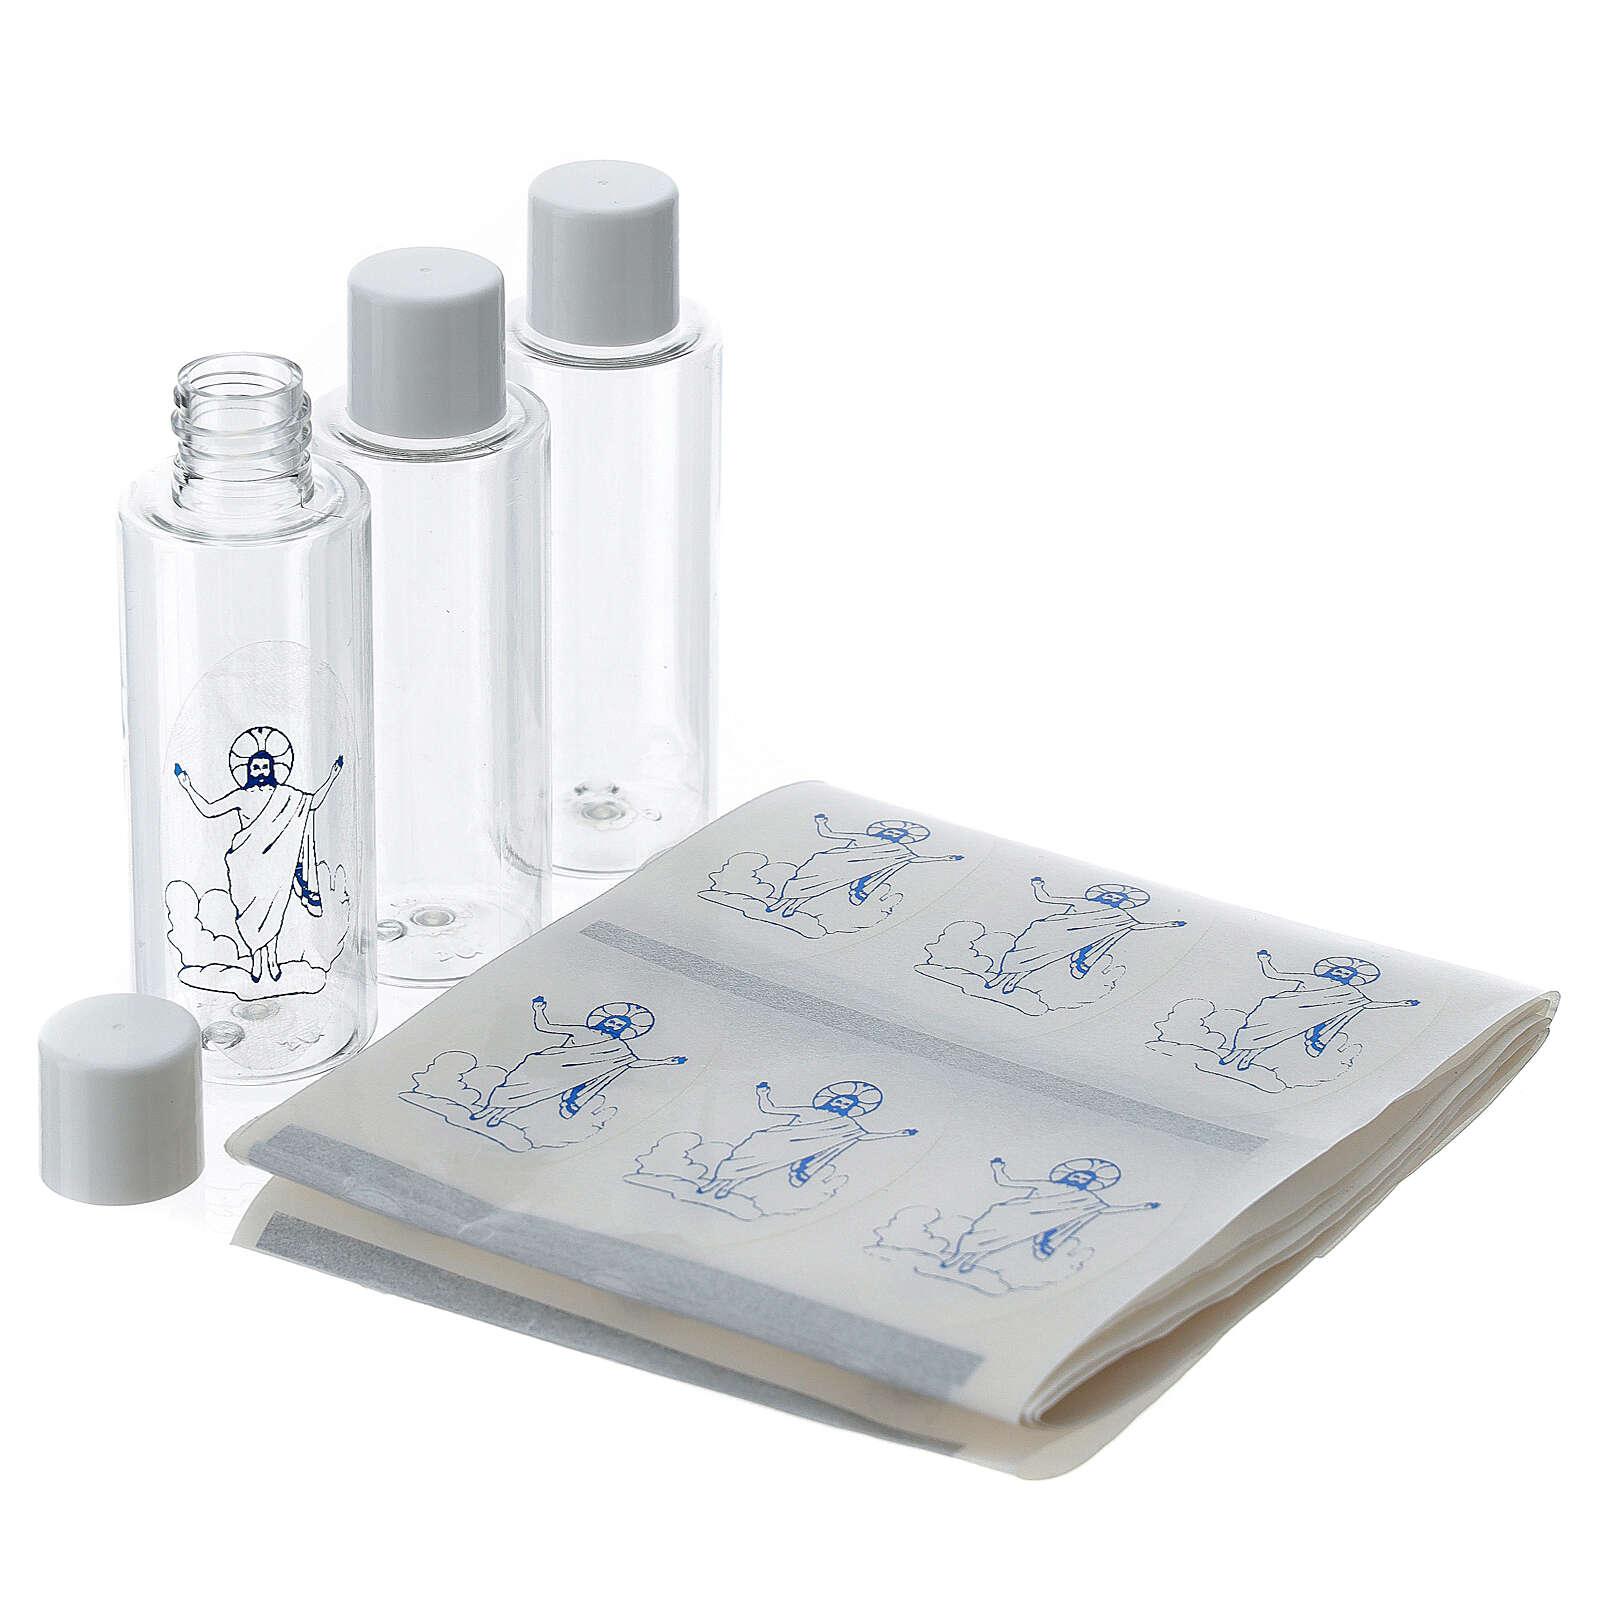 Holy water bottles, 100 pack 50 ml 3